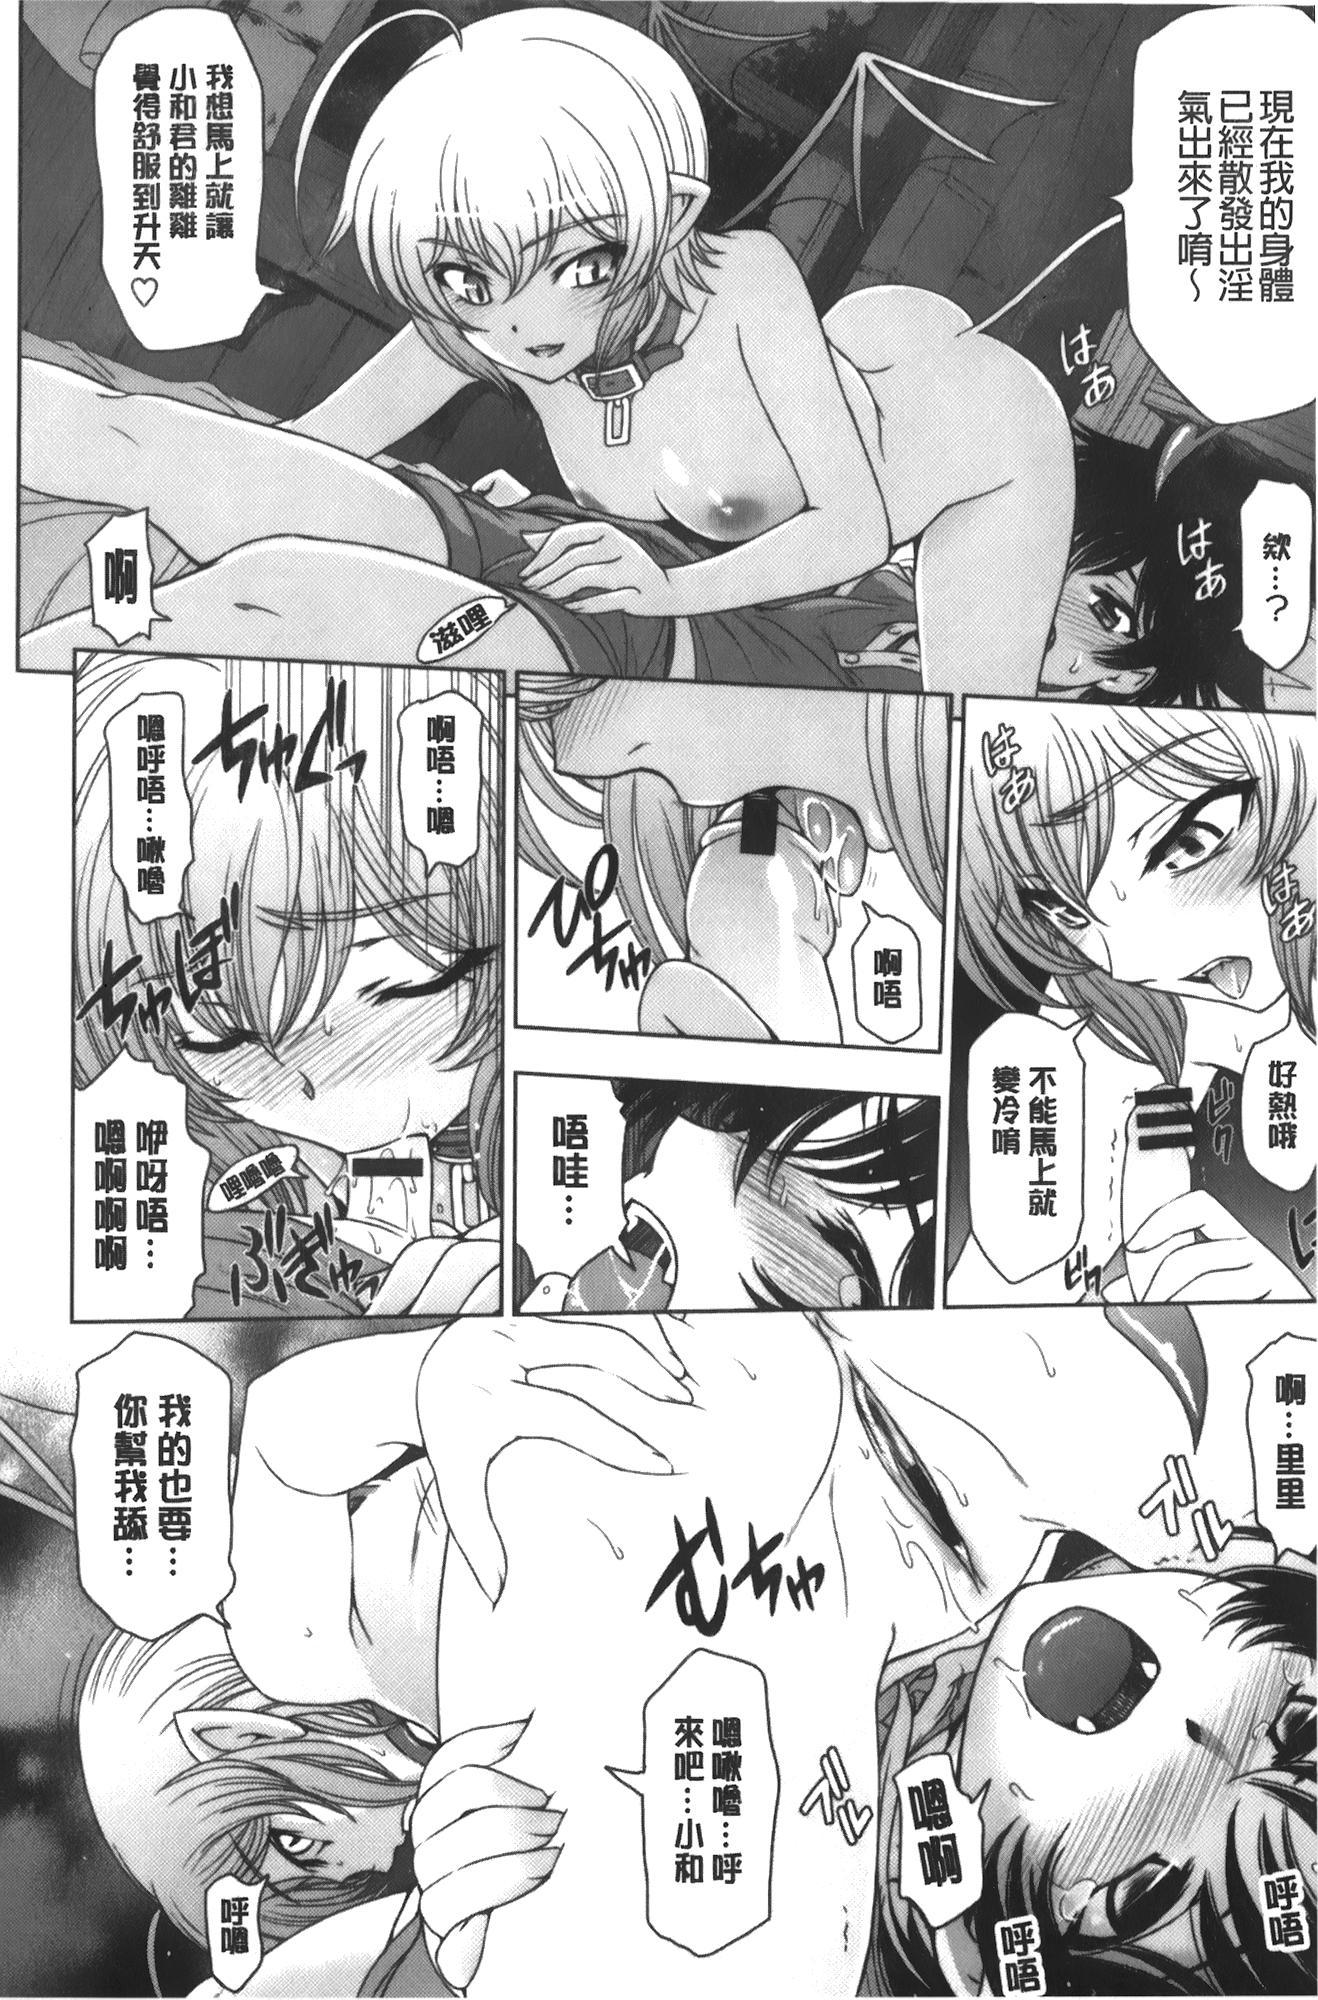 Majo × Shota ~ Genteiban | 魔女X小正太 限定版 40